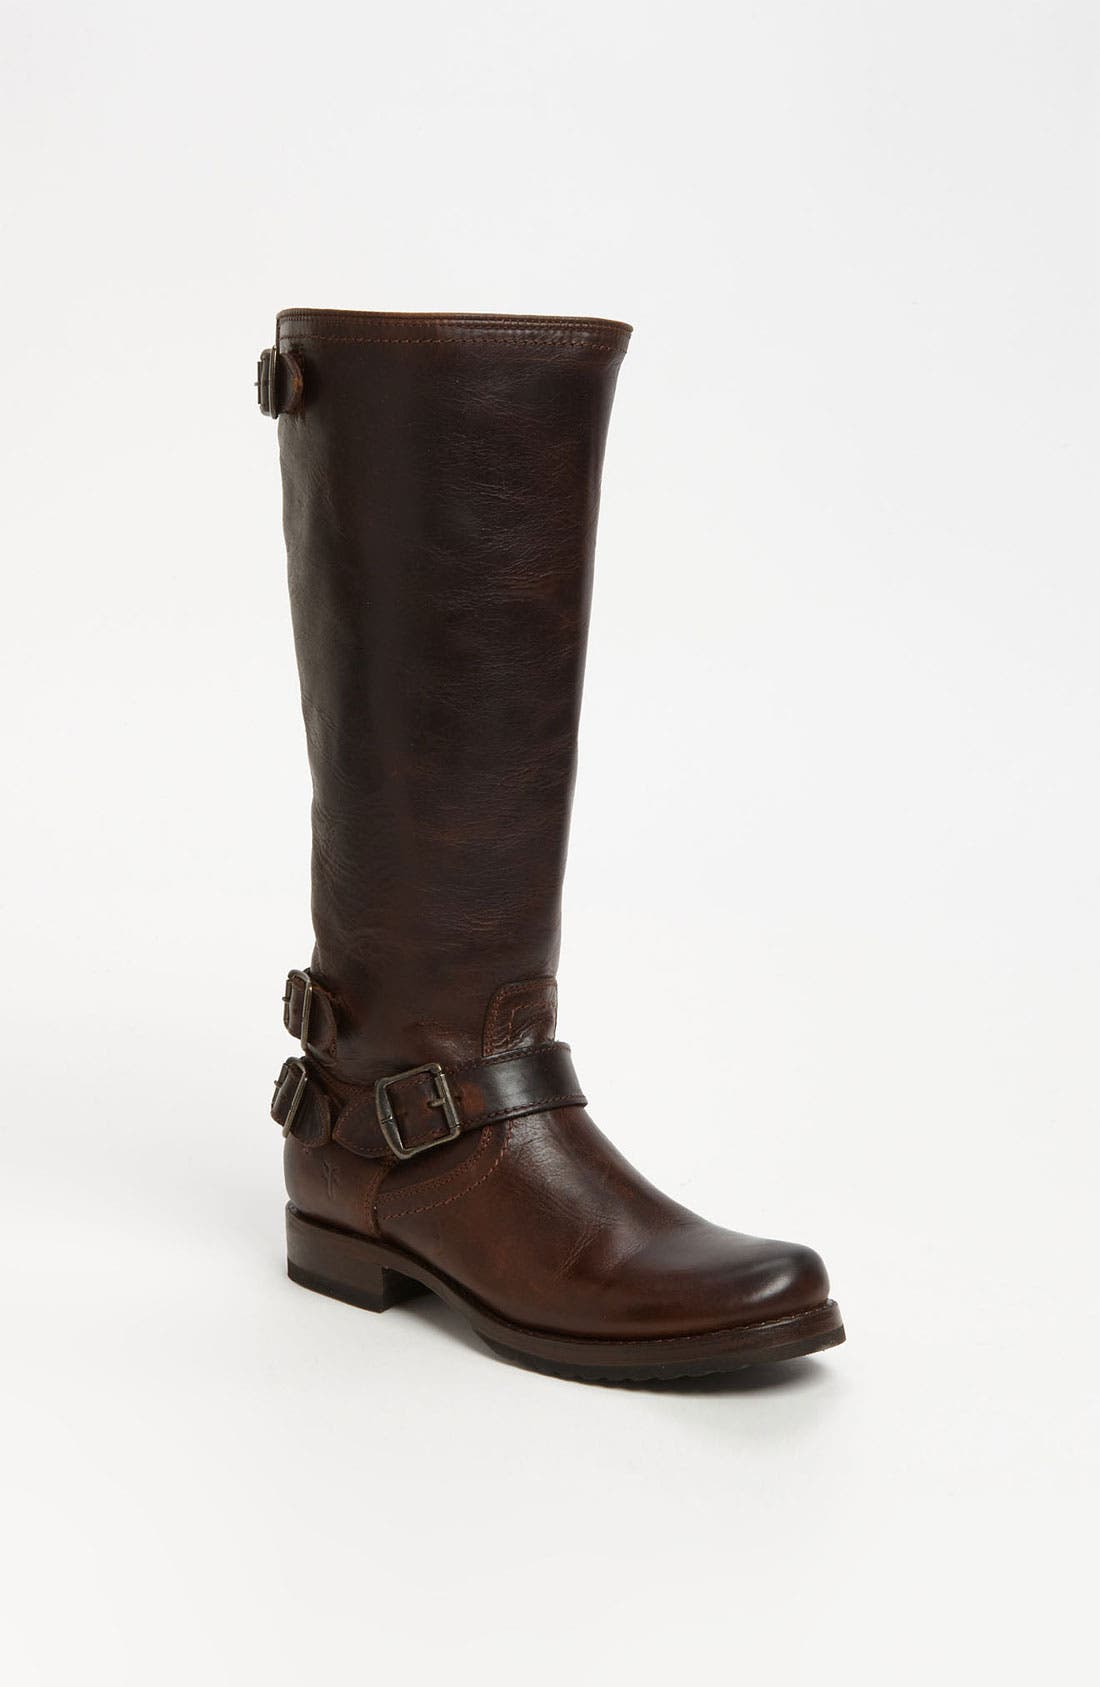 Alternate Image 1 Selected - Frye 'Veronica Back Zip' Boot